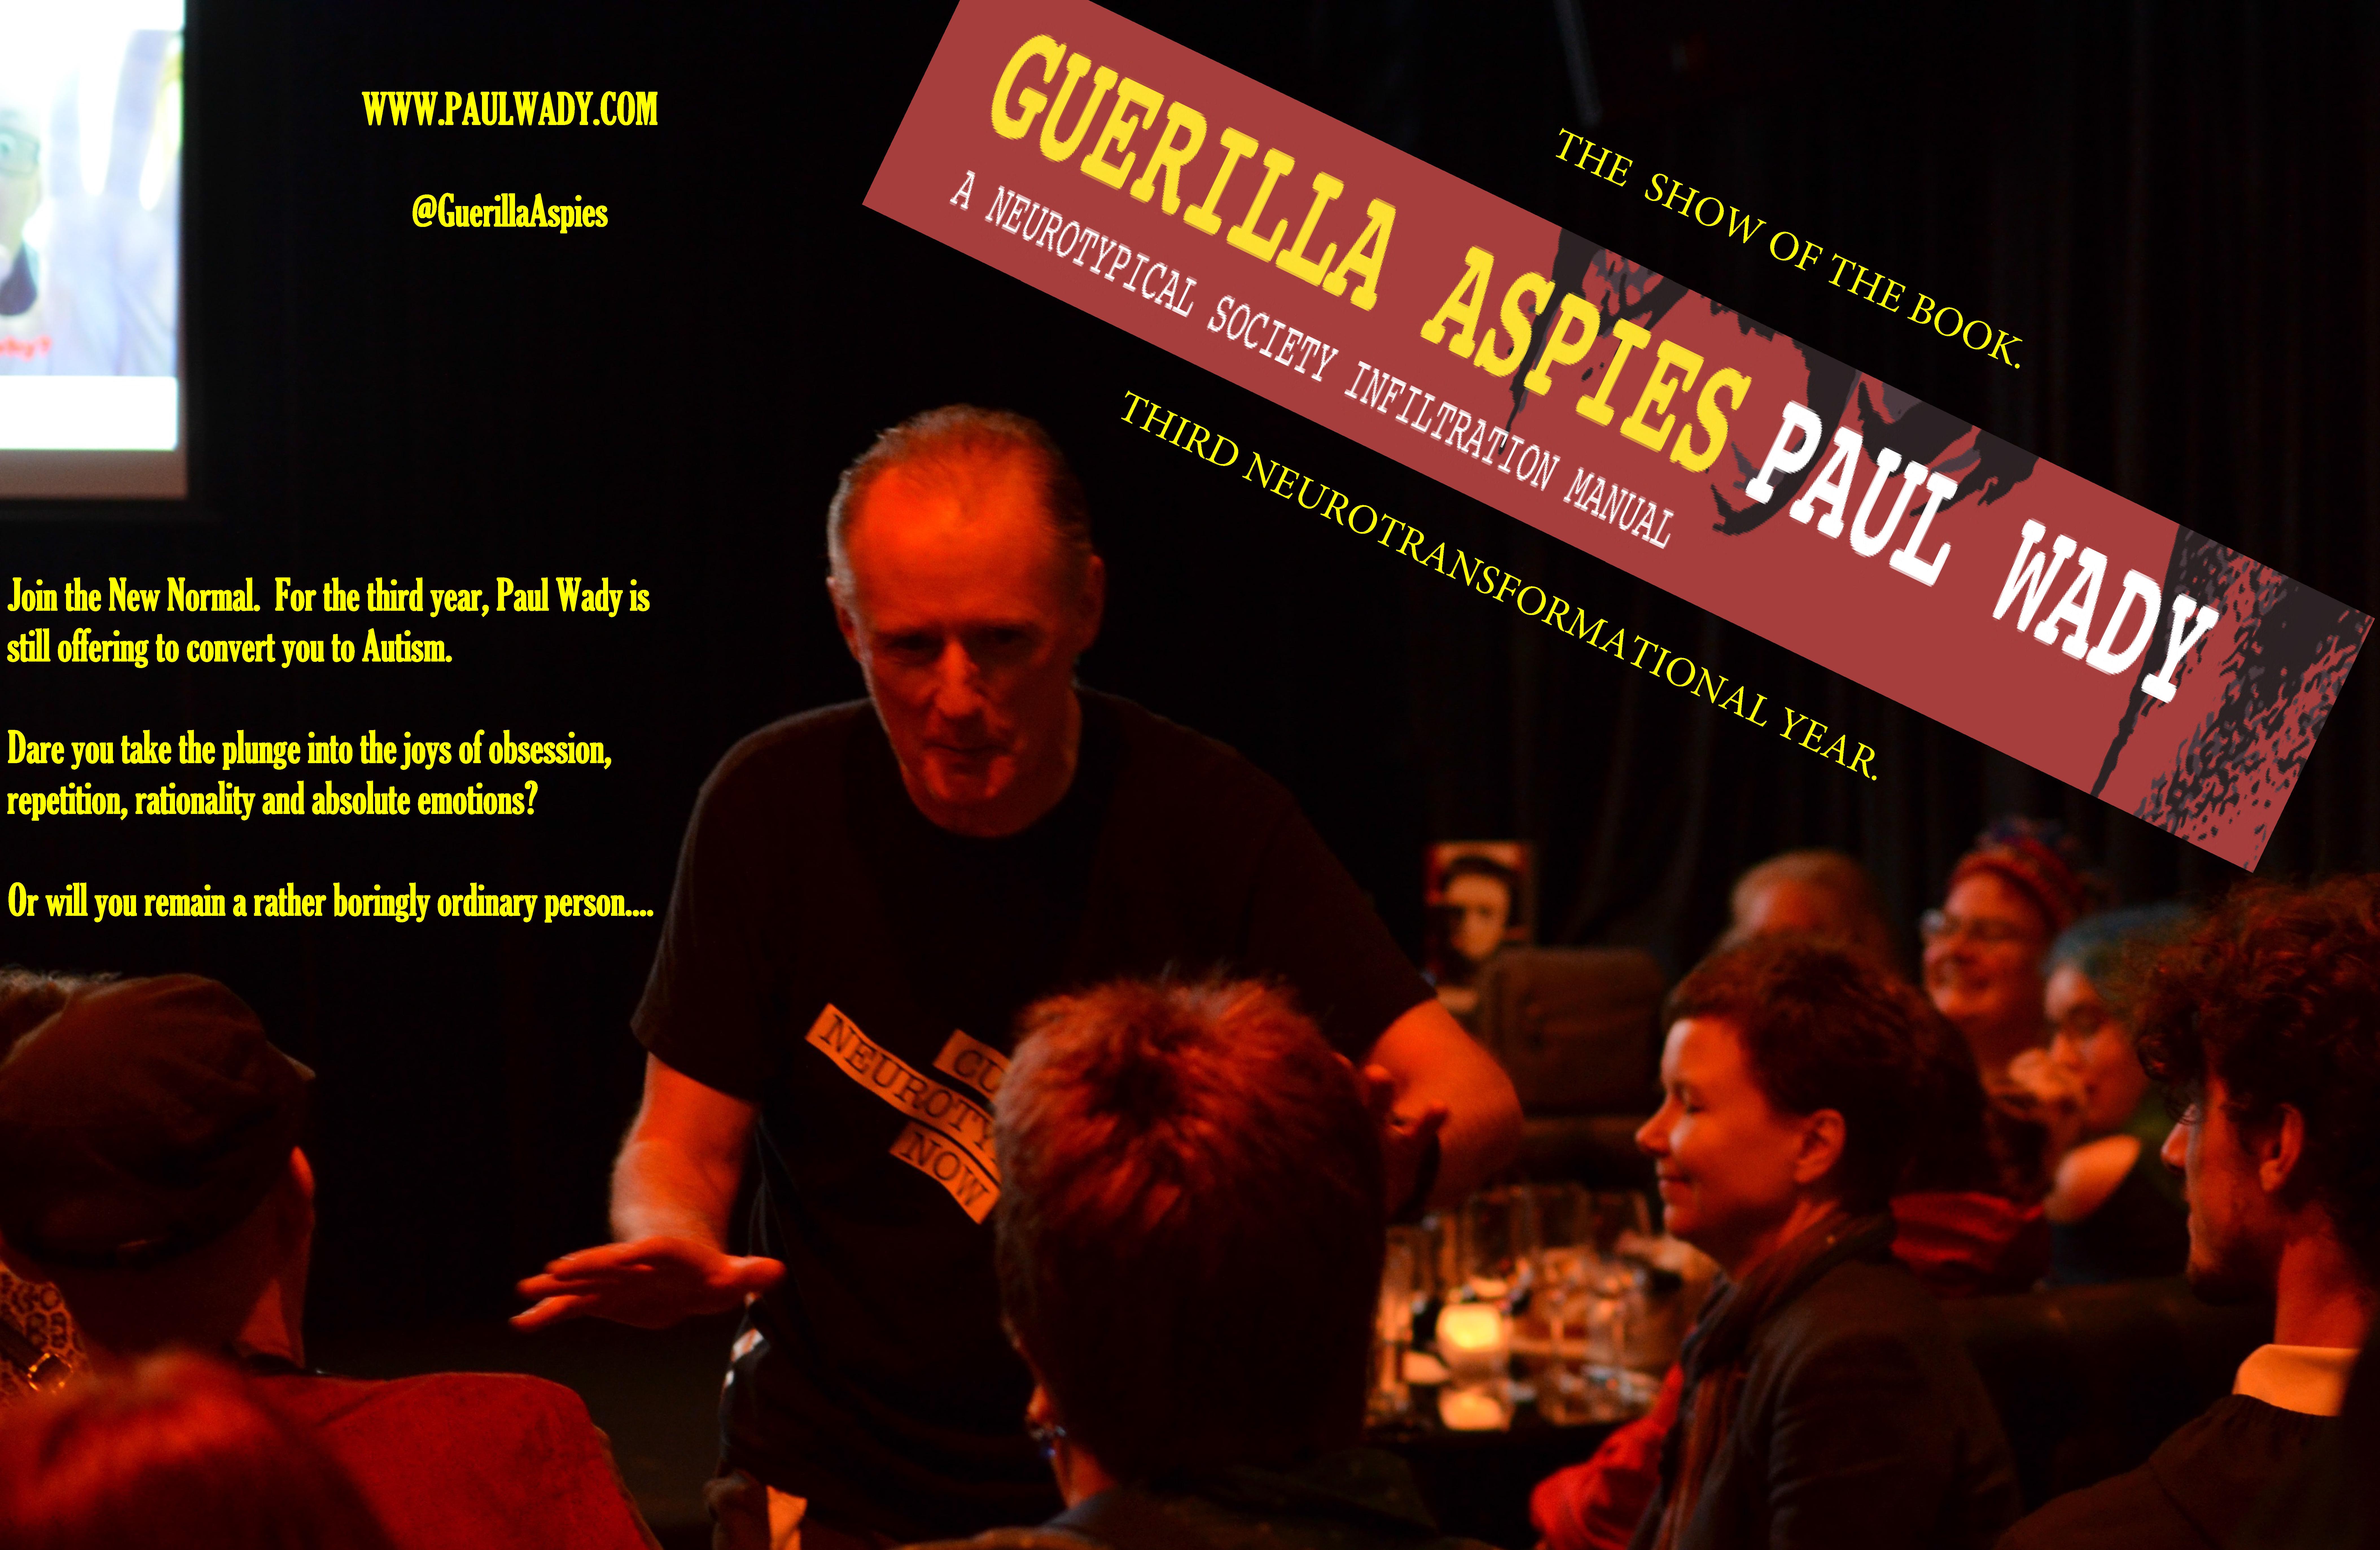 Guerilla Aspies show 2017 - One